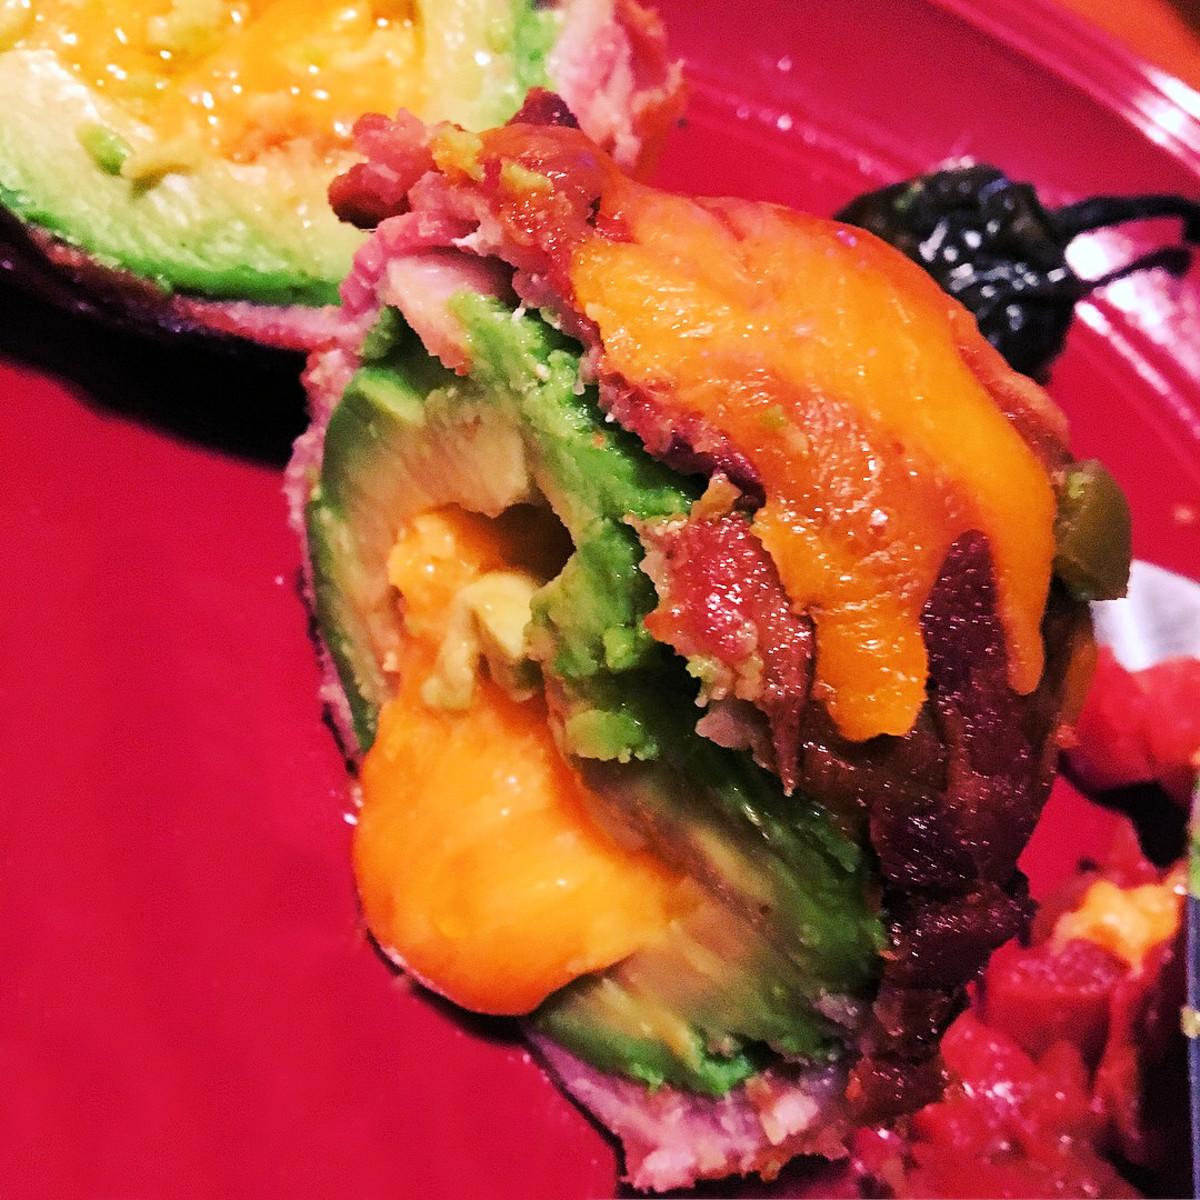 Bacon-Wrapped, Stuffed Avocado Recipe